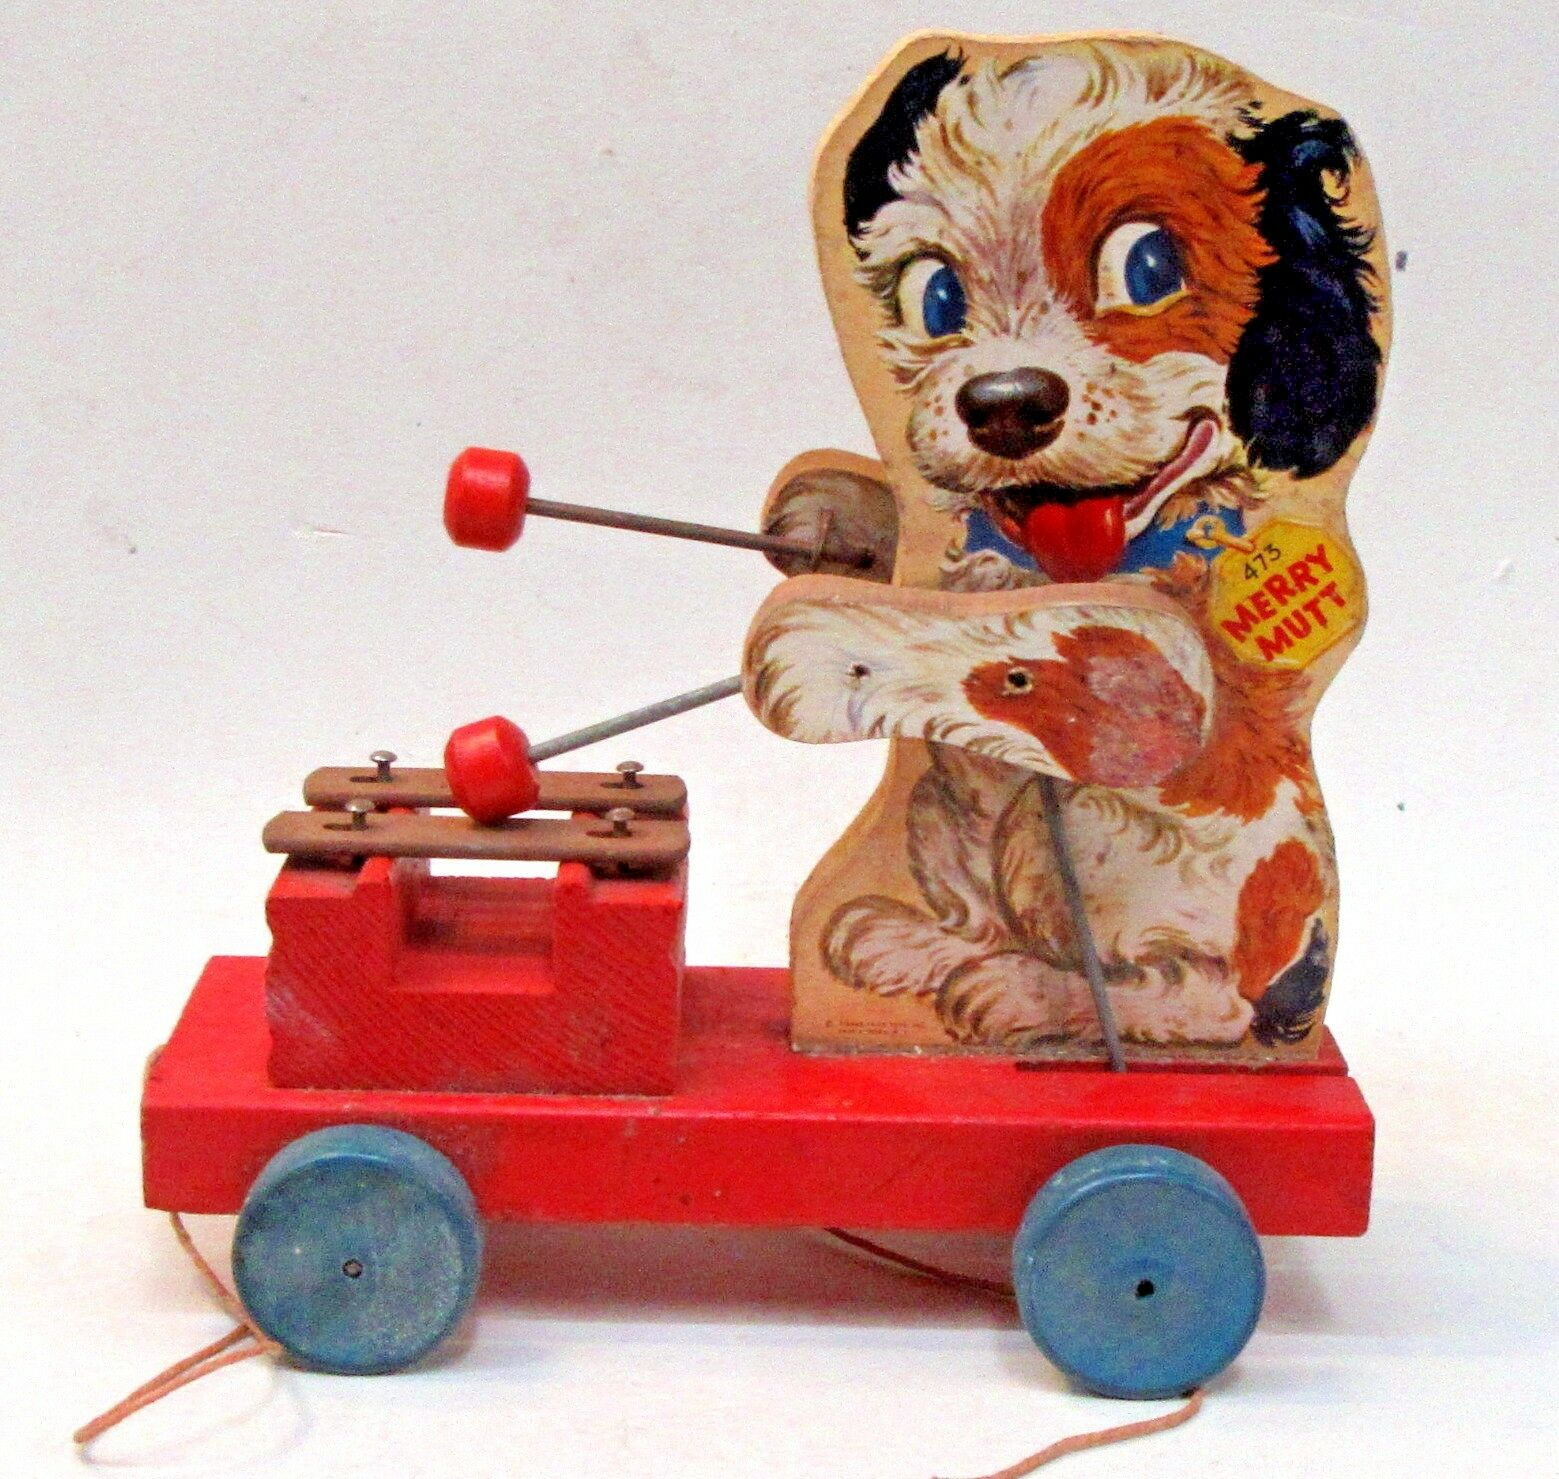 1949 Fisher Price Merry Mutt  473 tire de juguete. sin pérdida de papel